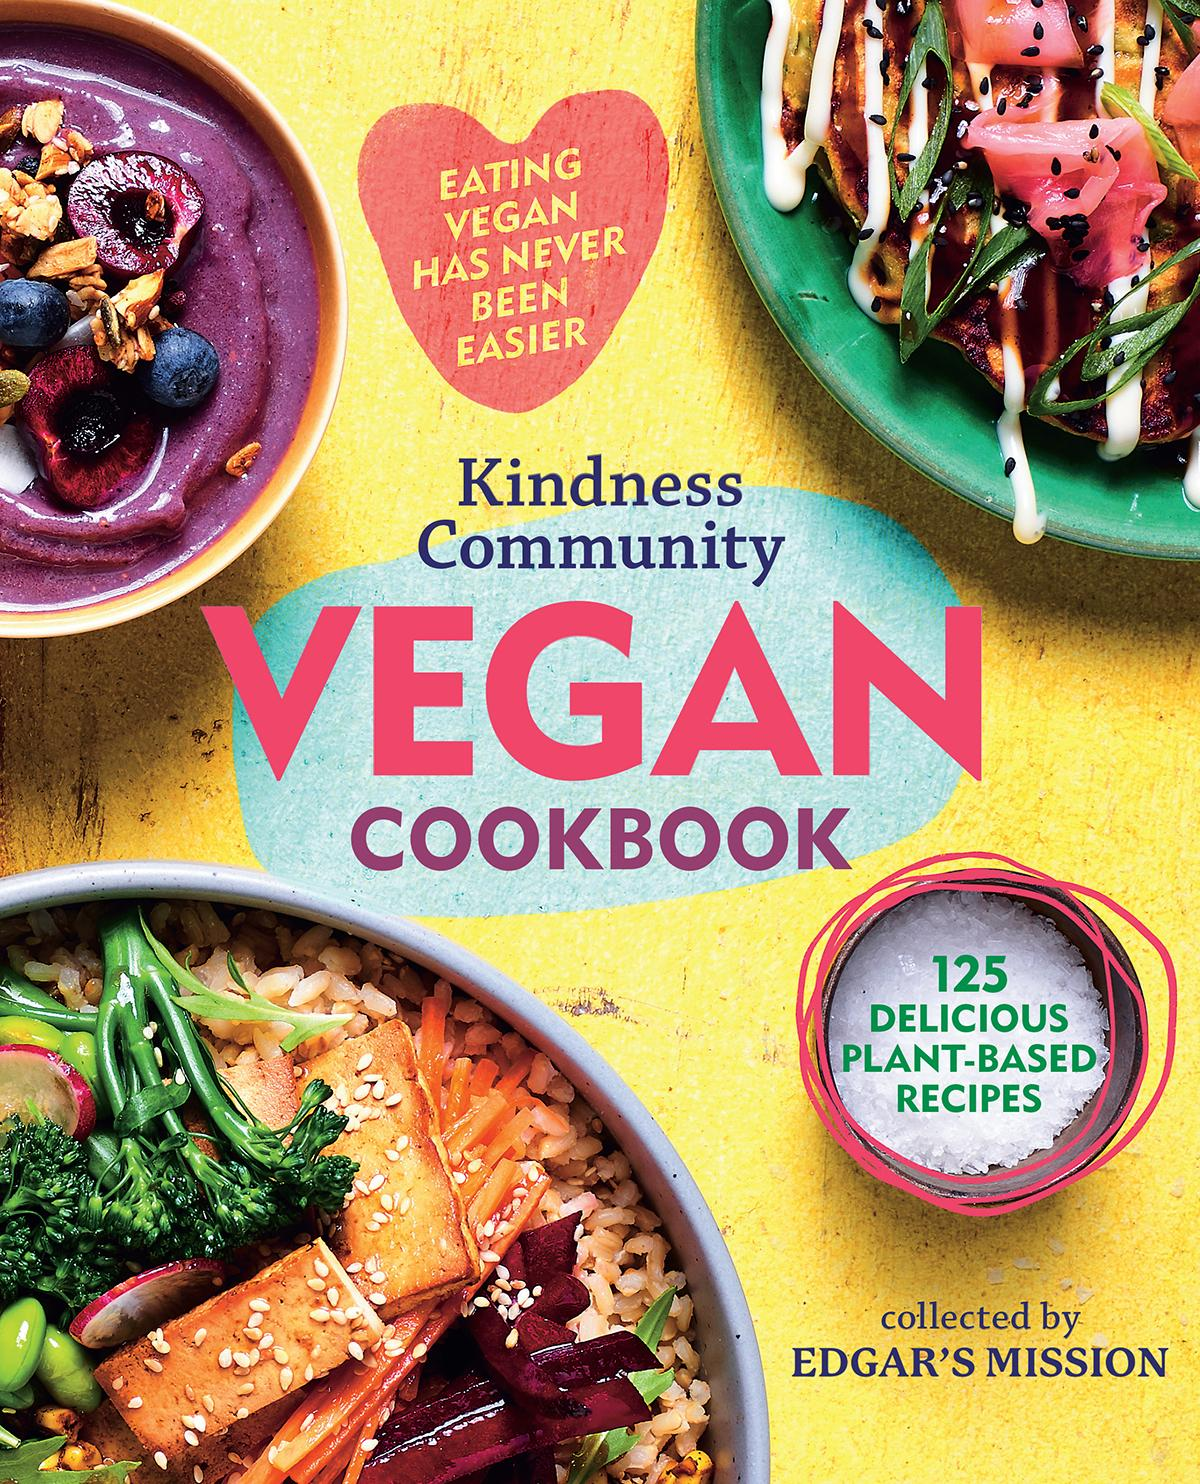 The Kindness CommunityVeganCookbook